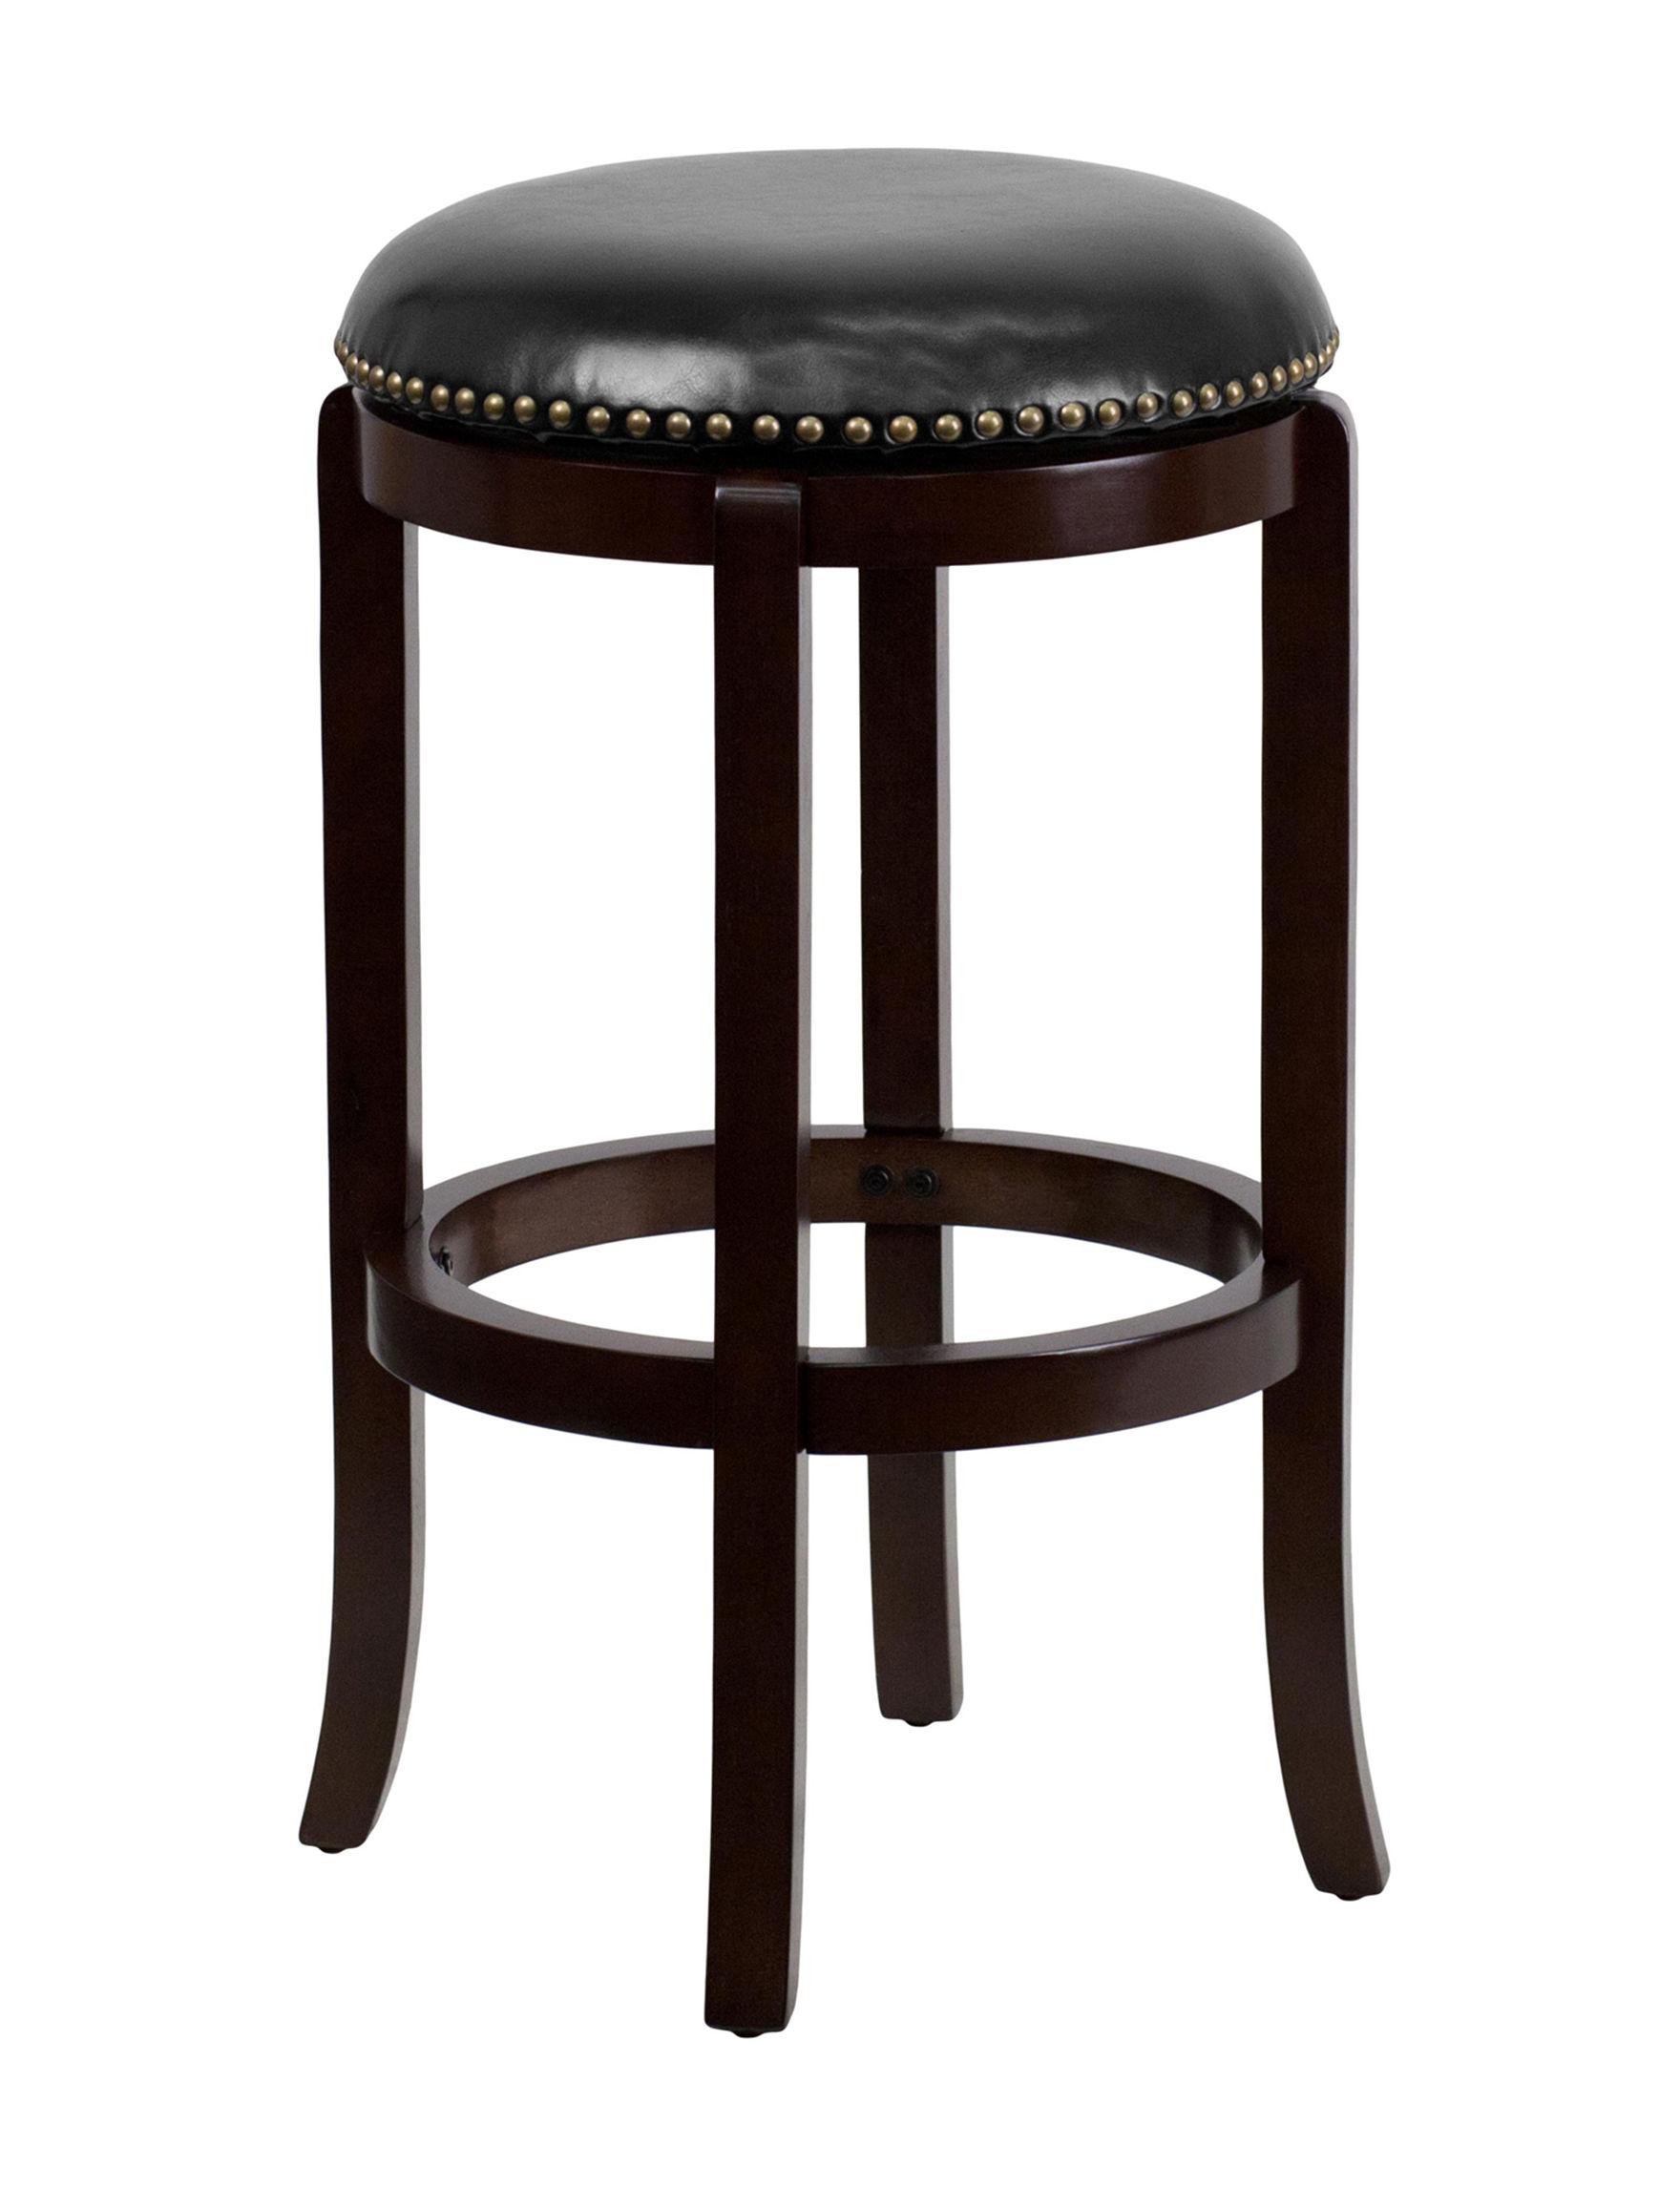 Flash Furniture Cappuccino Bar & Kitchen Stools Kitchen & Dining Furniture